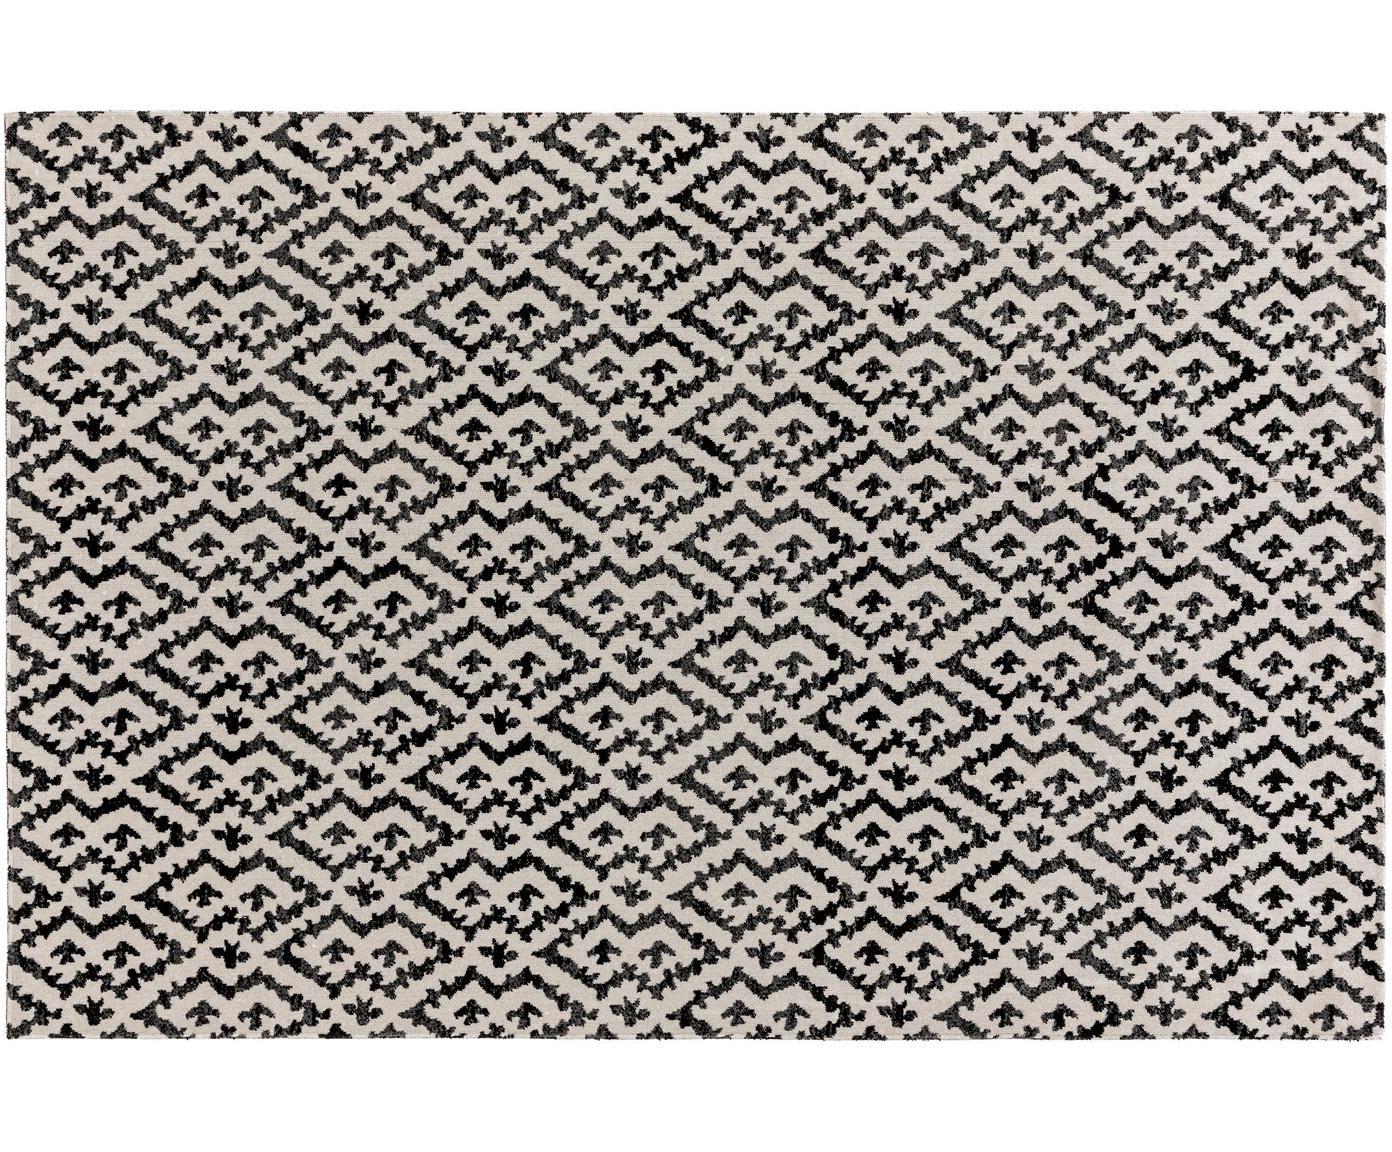 Alfombra de interior/exterior Jerry, estilo étnico, Polipropileno, Negro, blanco, An 160 x L 230 cm (Tamaño M)